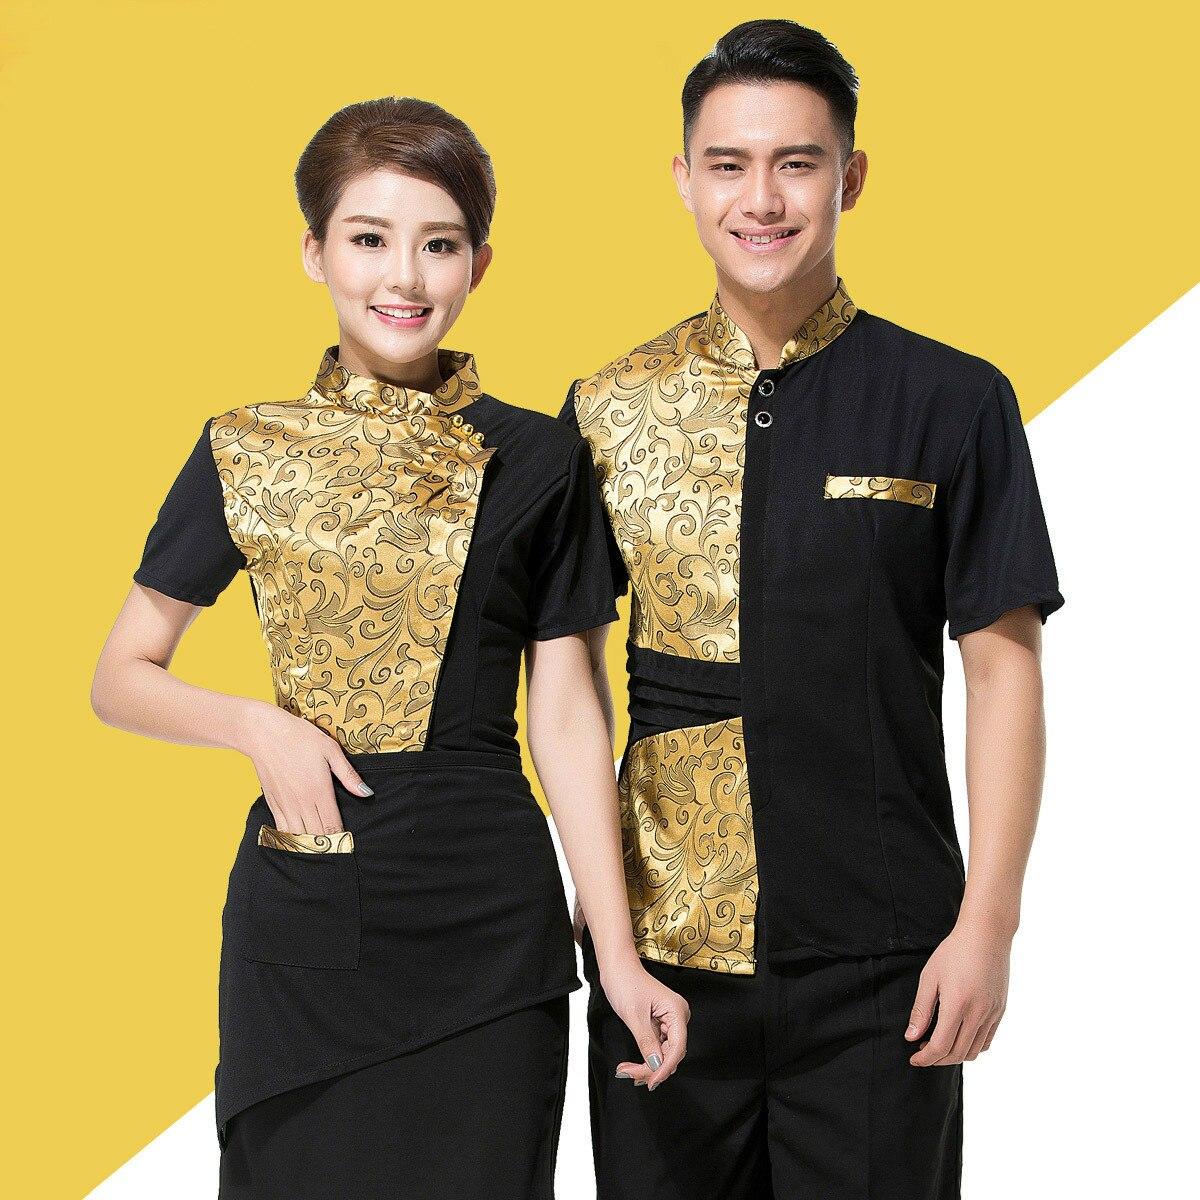 Hotel Waiter Work Clothes Summer Hot Pot Shop Staff Uniform Women Restaurant Short-sleeved Breathable Catering Overalls H2210